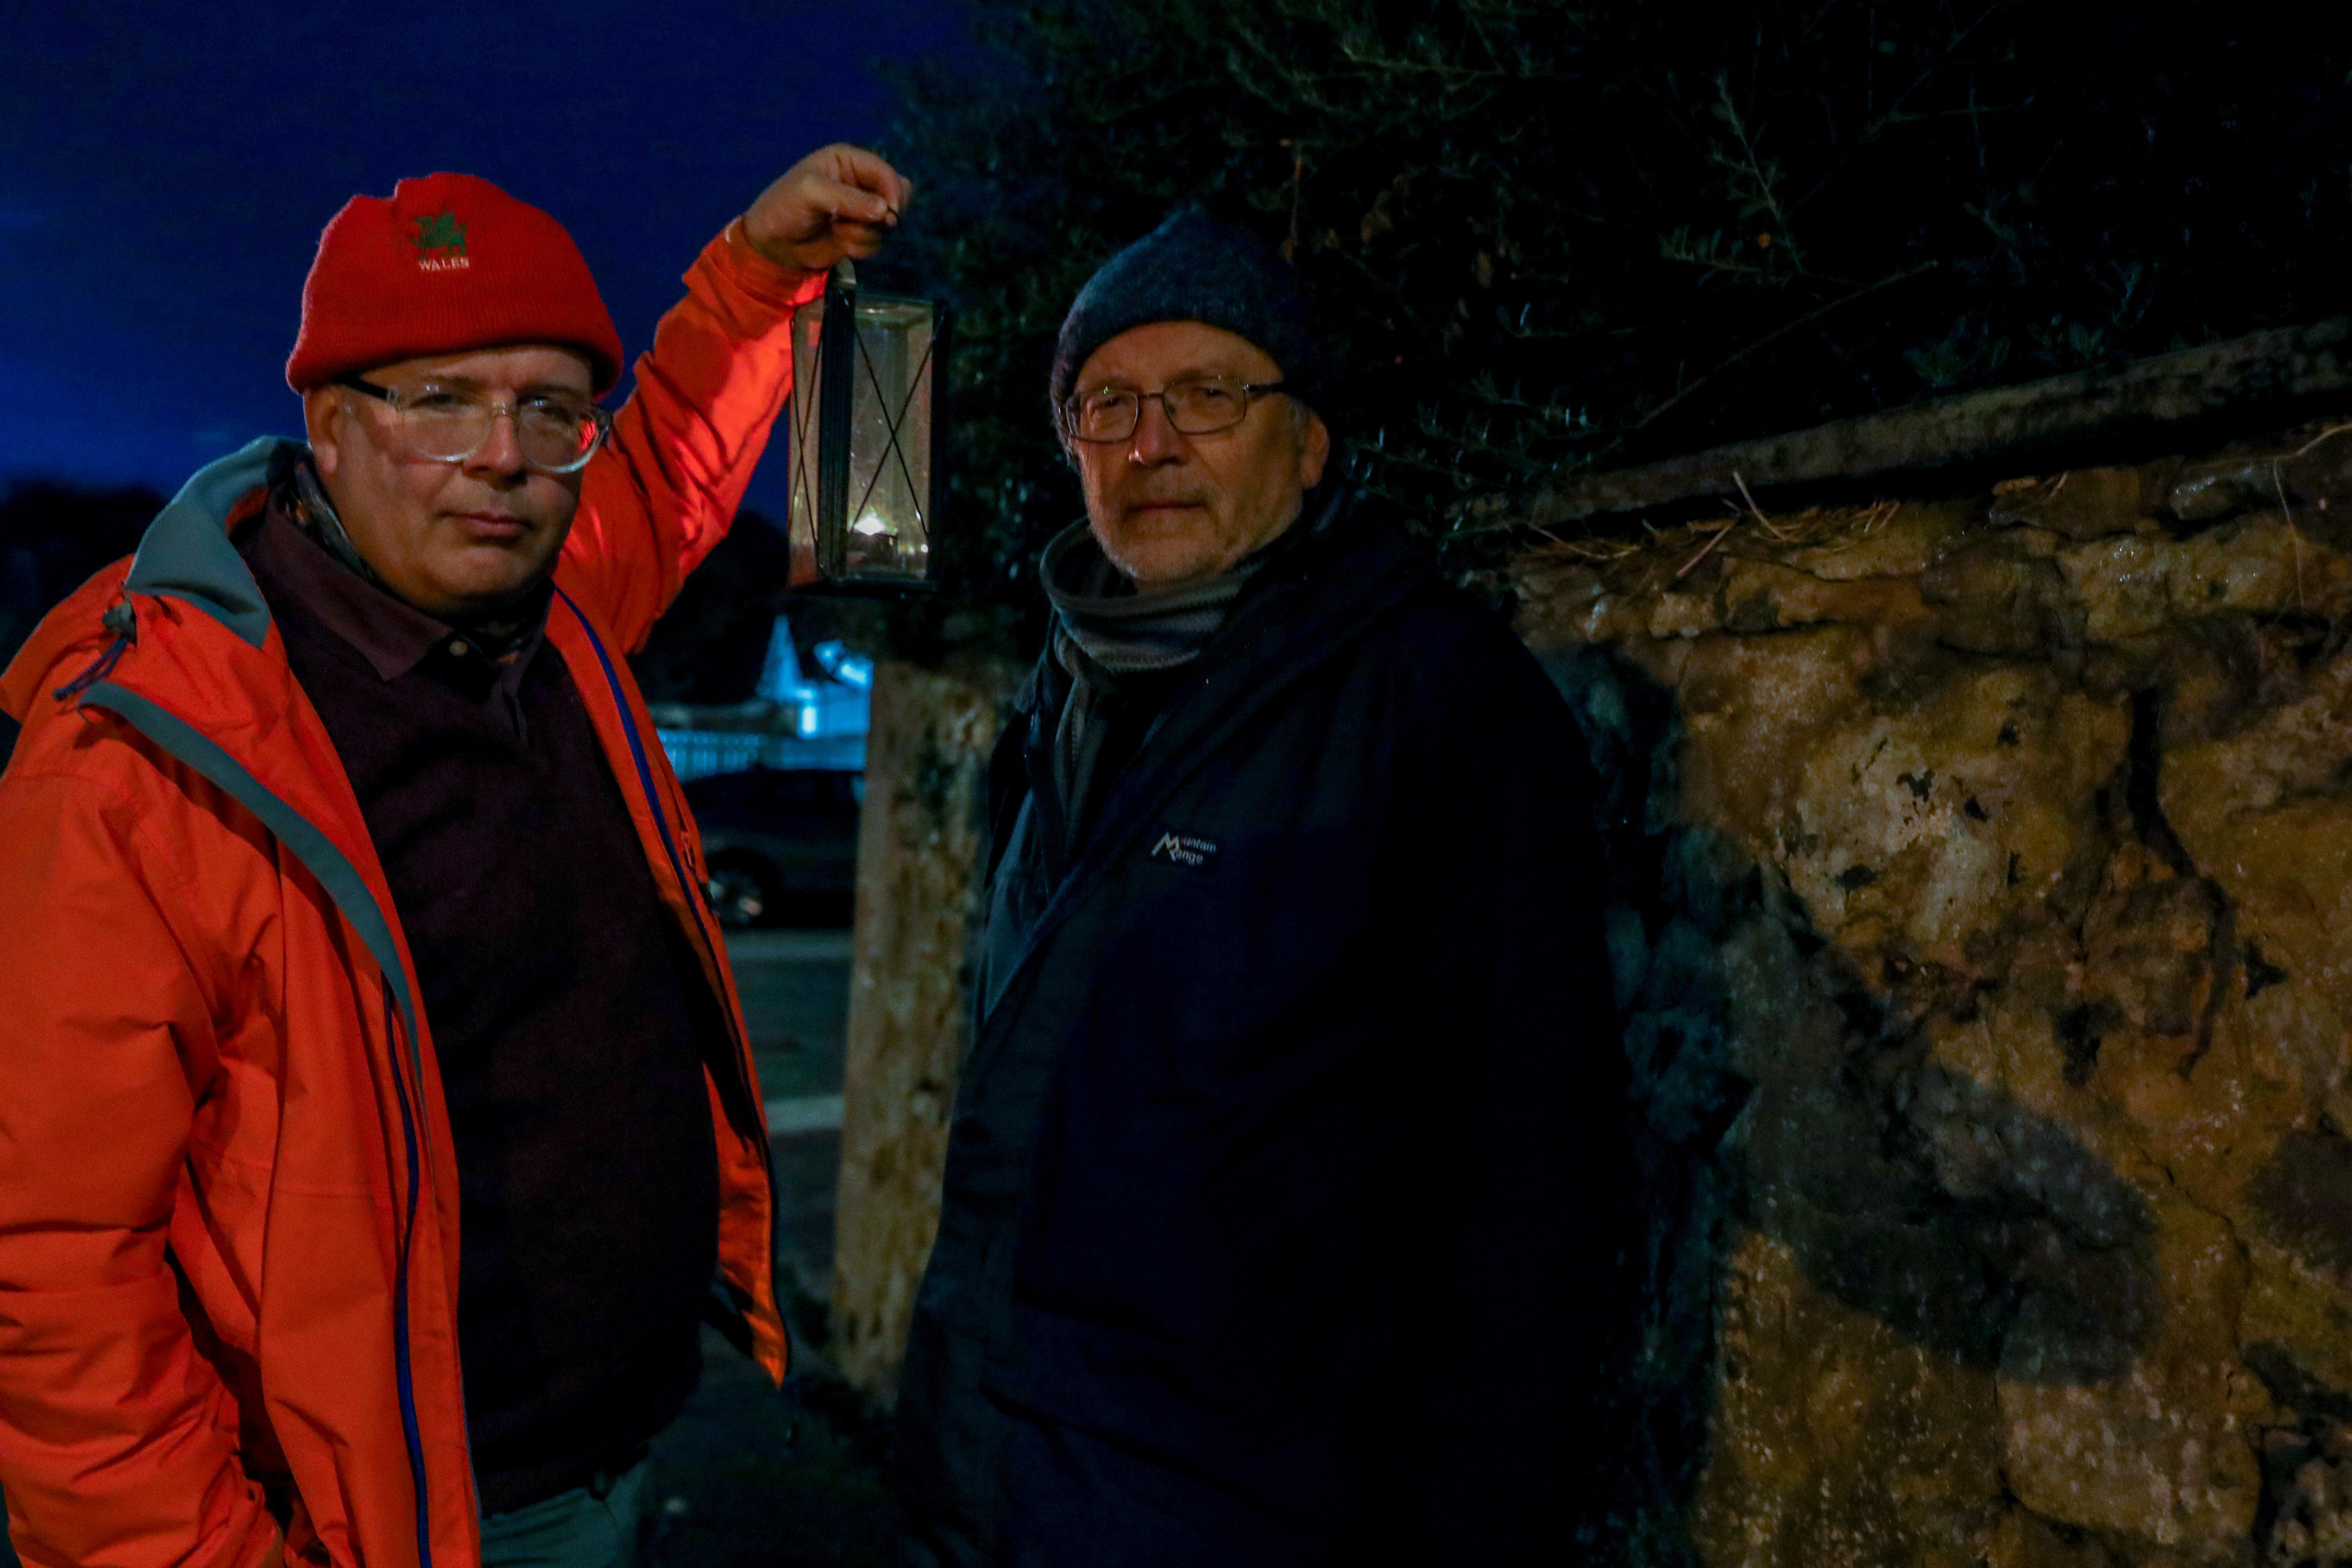 Cllr Jonny Tepp & Cllr Tim Brett in Richard Street, Newport where street lighting problems have been ongoing